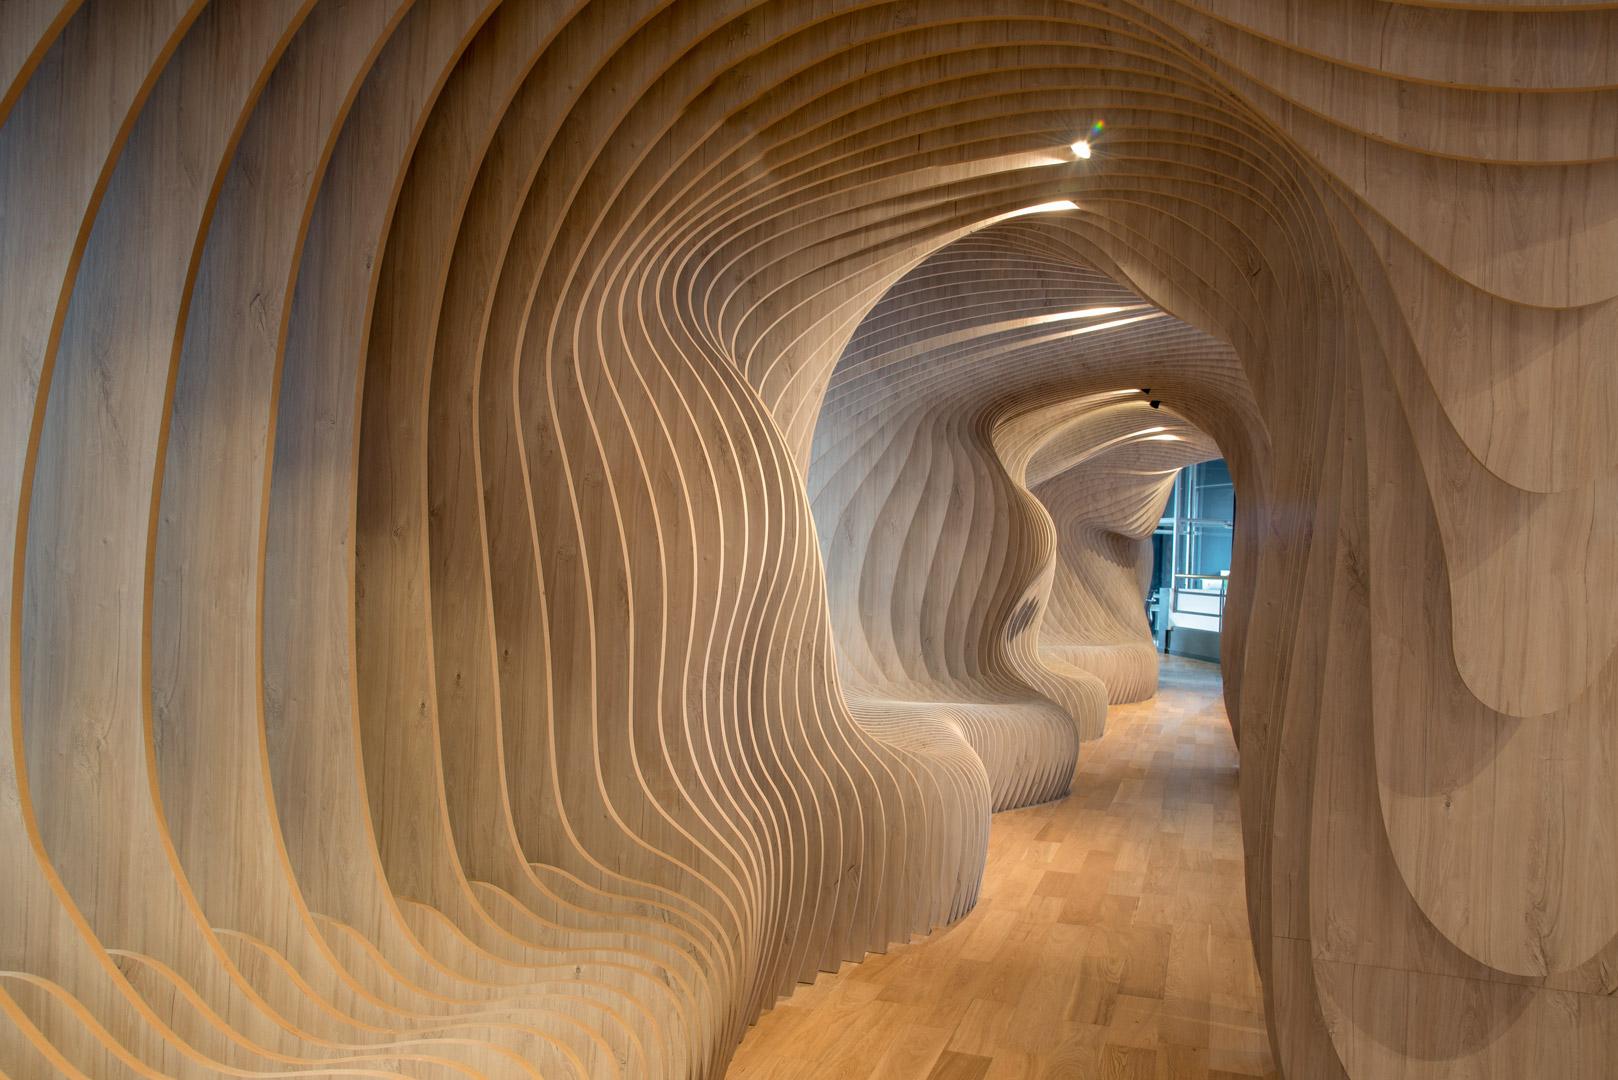 Espacio Patagonia Flooring Center. Diseño Paramétrico en melamina.